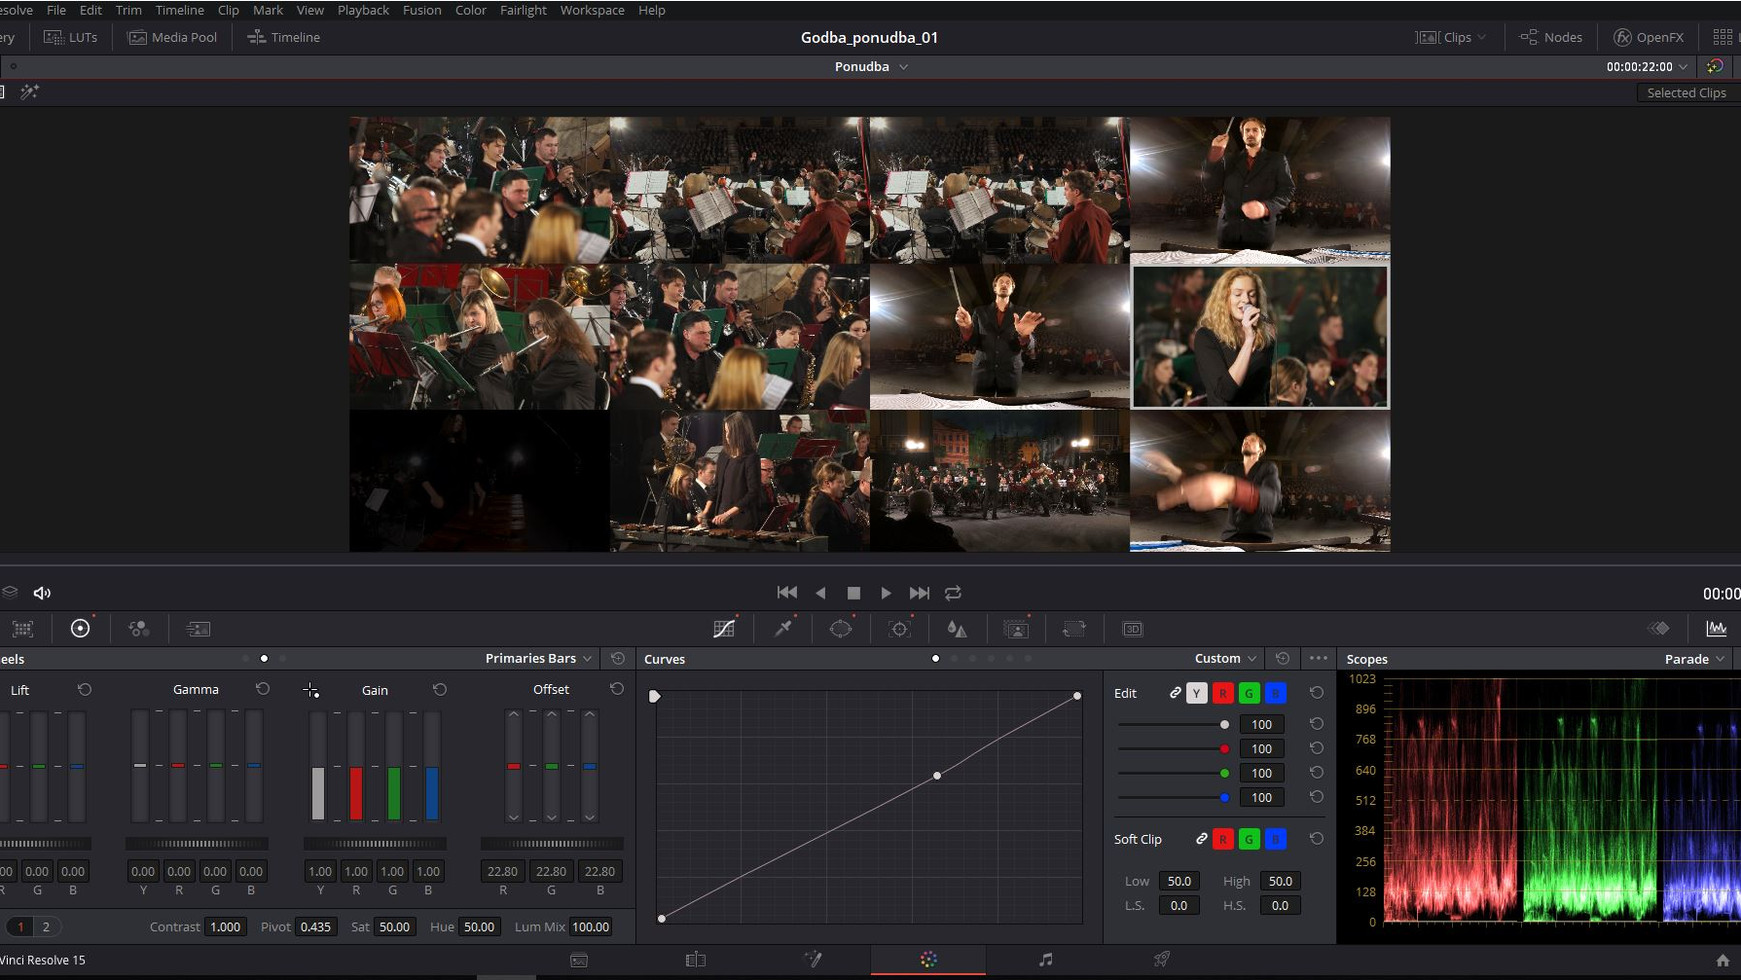 Proces usklajevanja kamer - camera matching